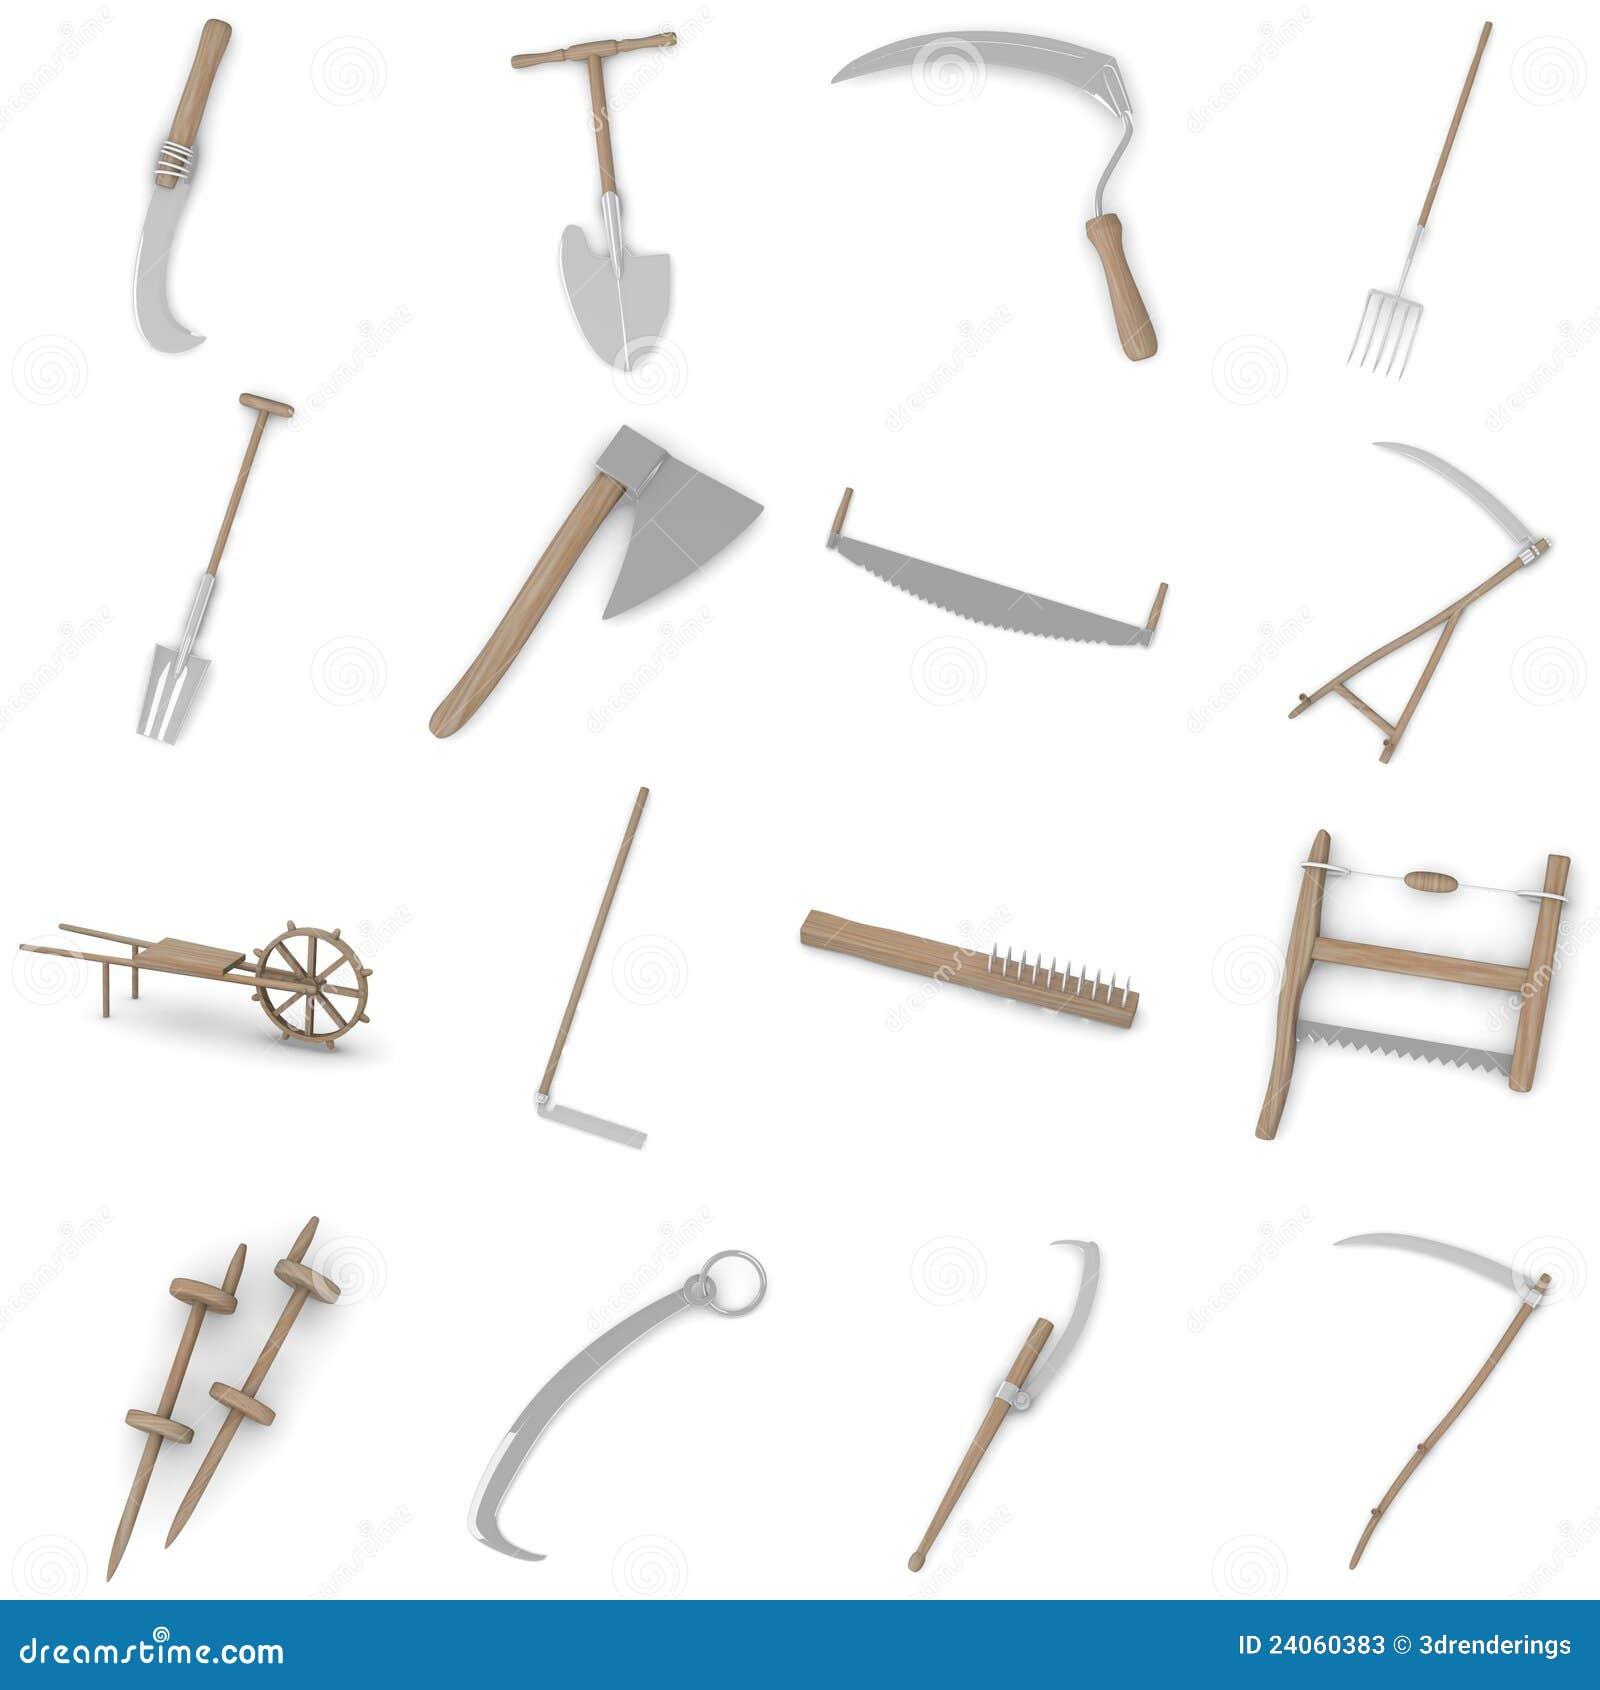 Farming Tools - 16 Stock Photos - Image: 24060383